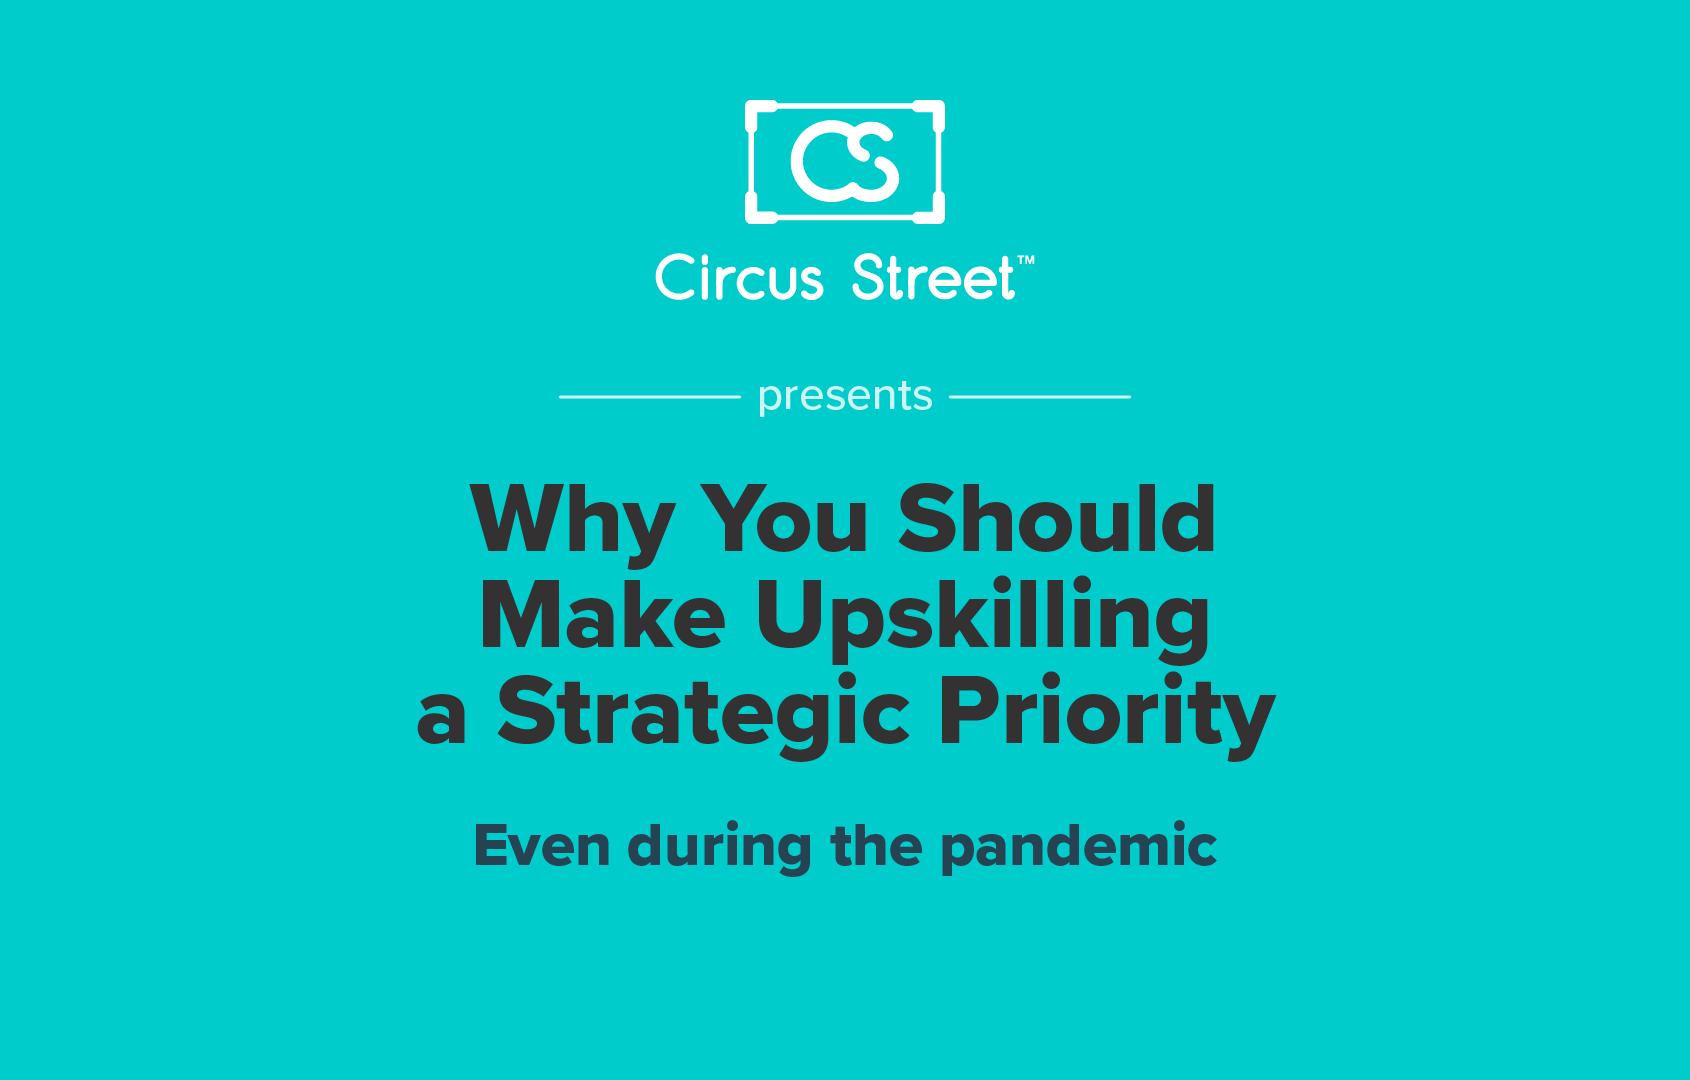 Why You Should Make Upskilling a Strategic Priority